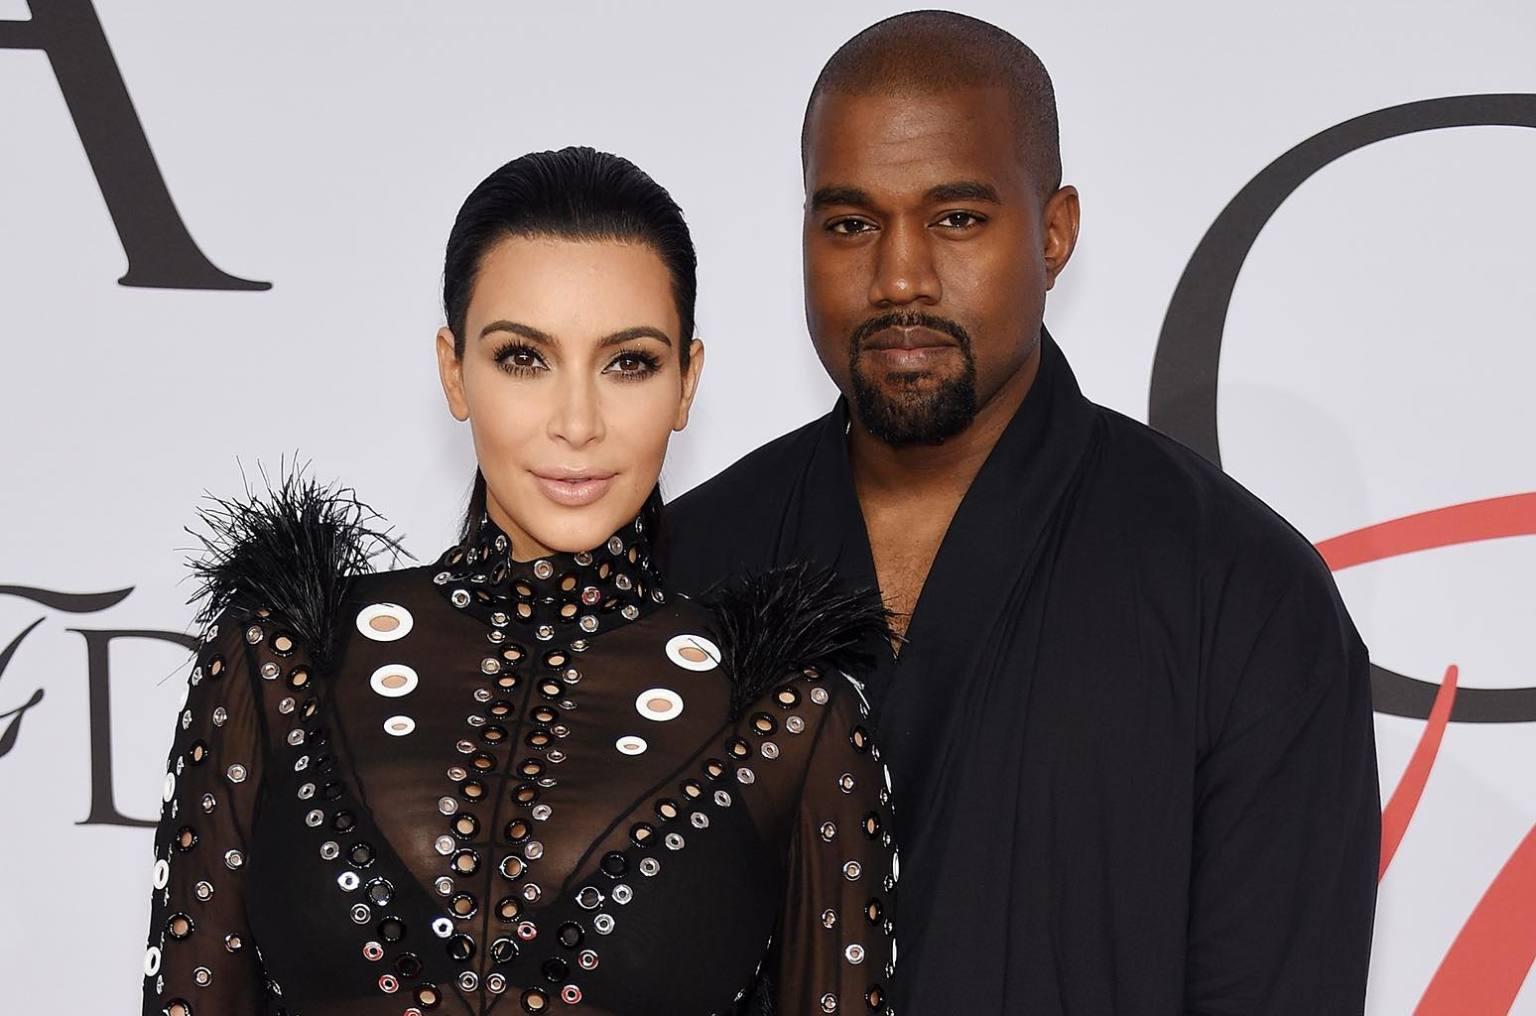 ¿Kim Kardashian le ha pedido el divorcio a Kanye West?